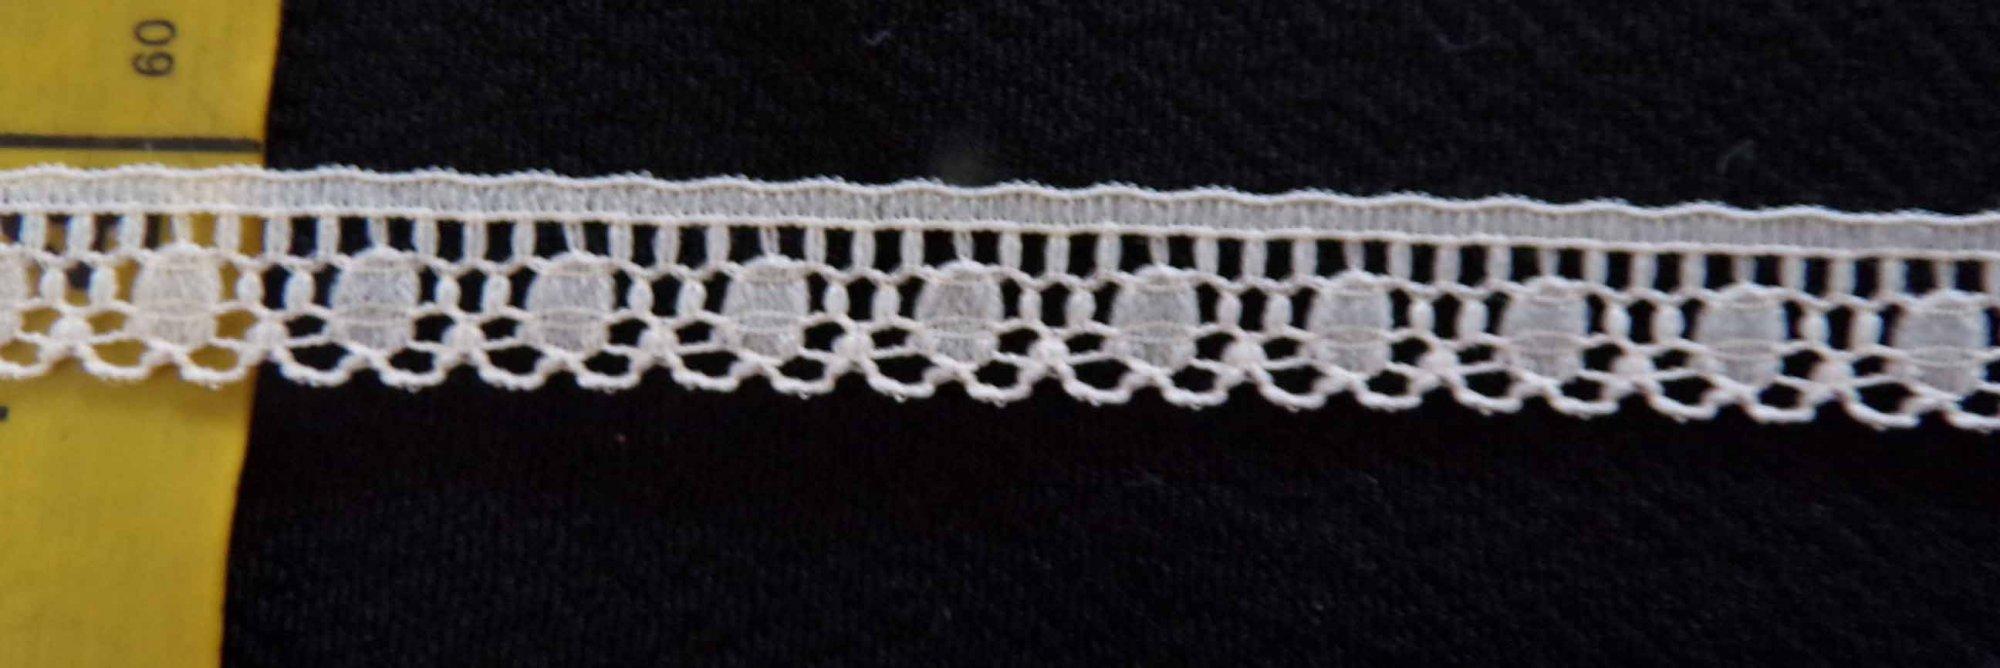 3/8 Rigid Lace - Beige